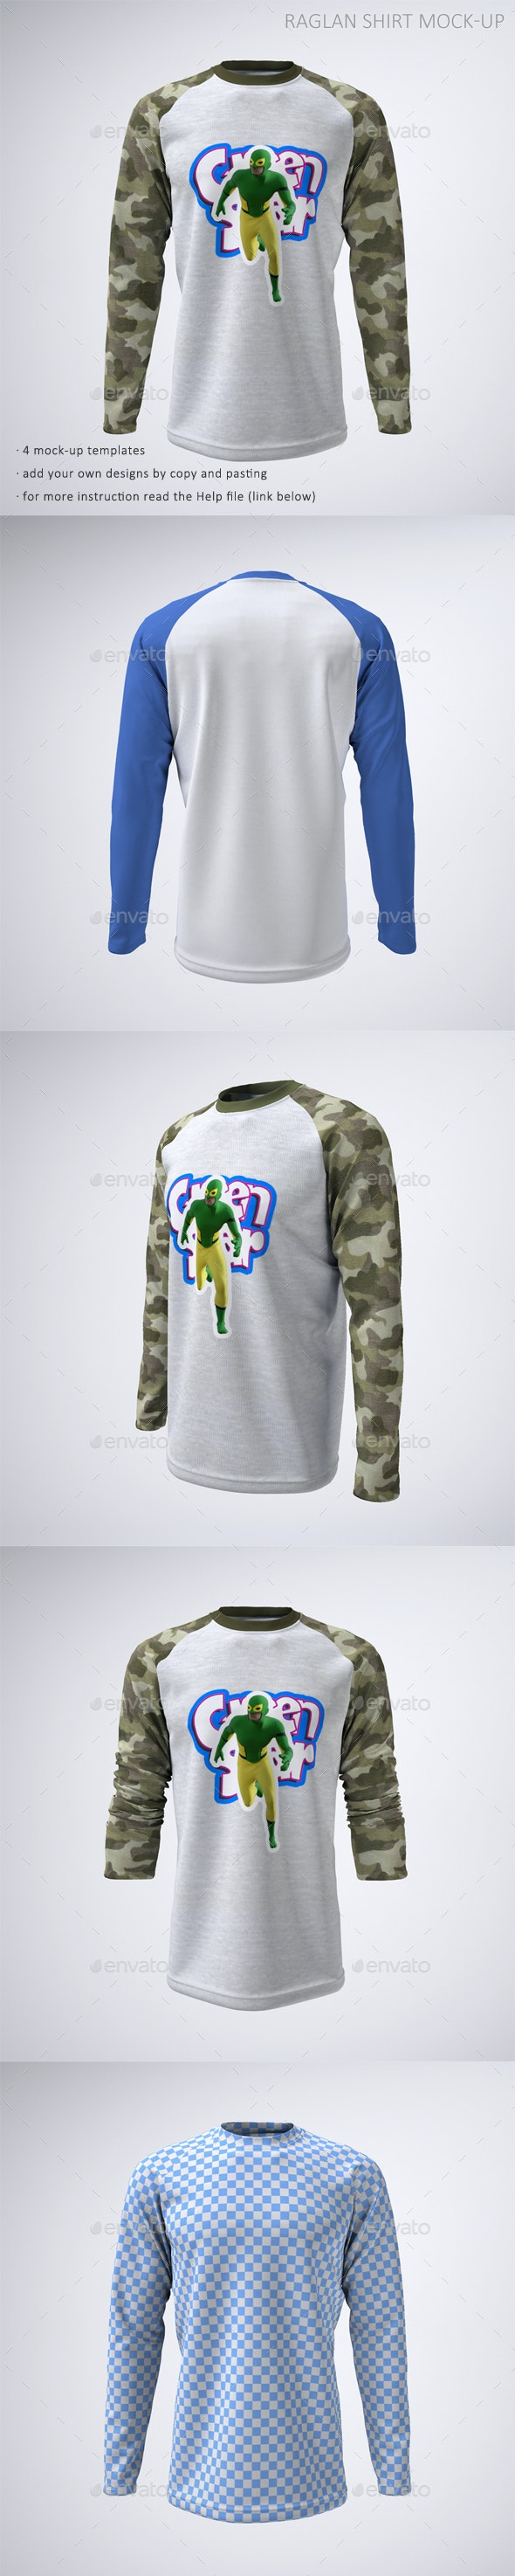 Long Sleeve Raglan or Baseball T-Shirt Mock-Up - T-shirts Apparel